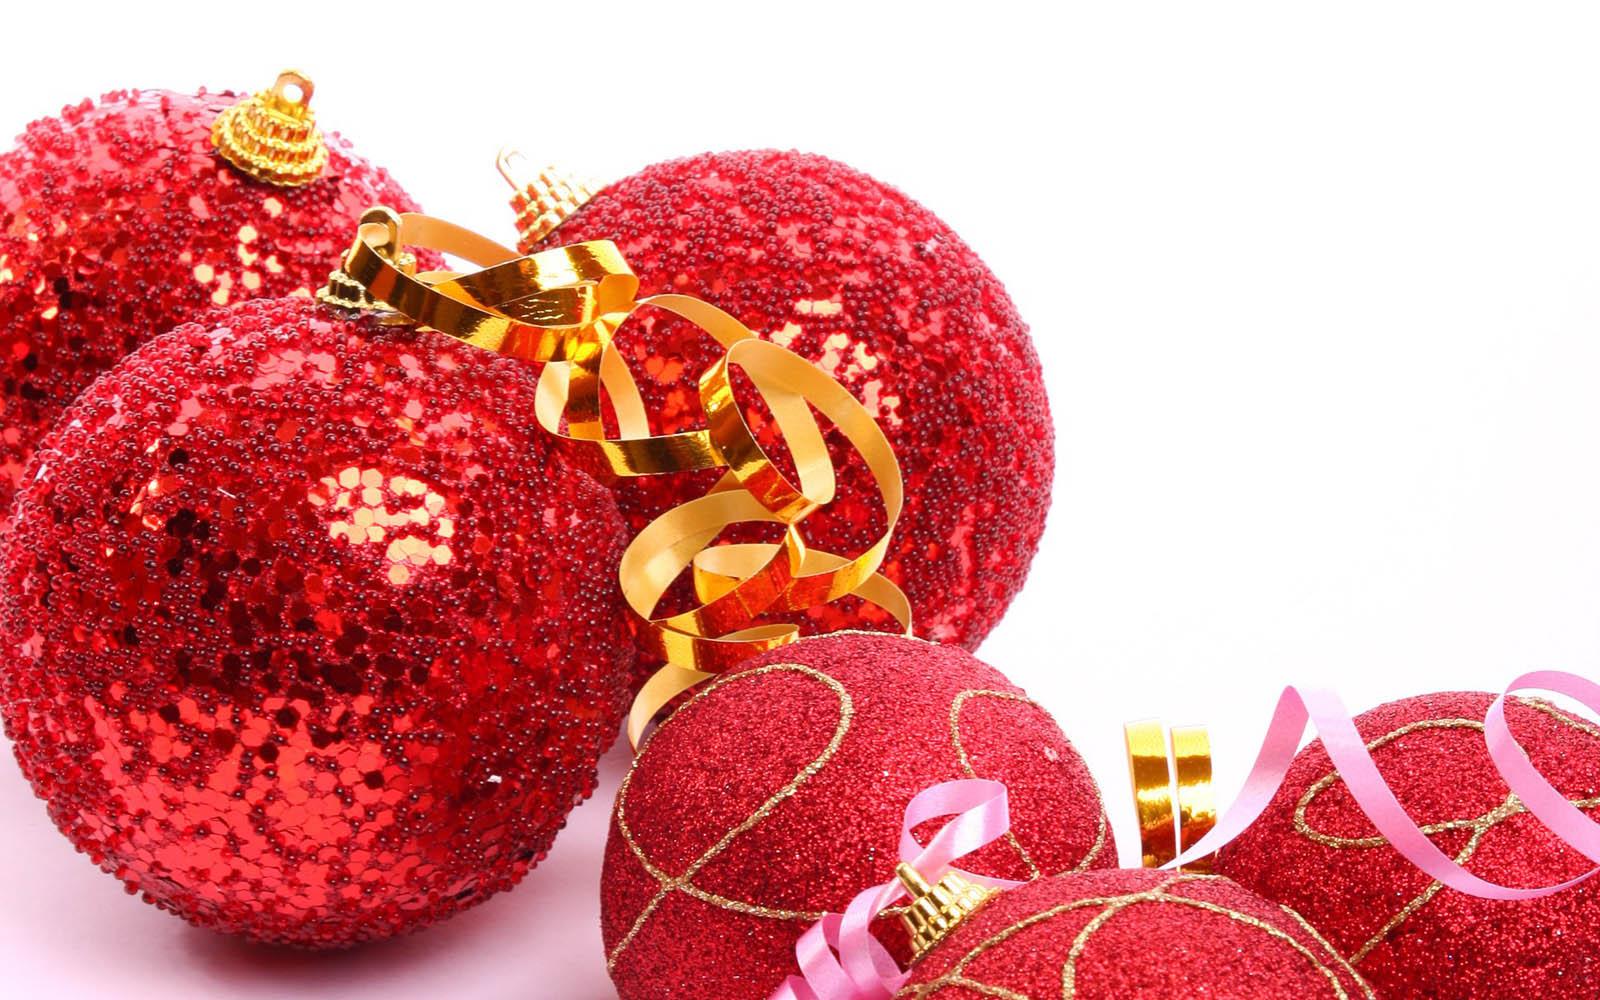 christmas balls background - photo #9